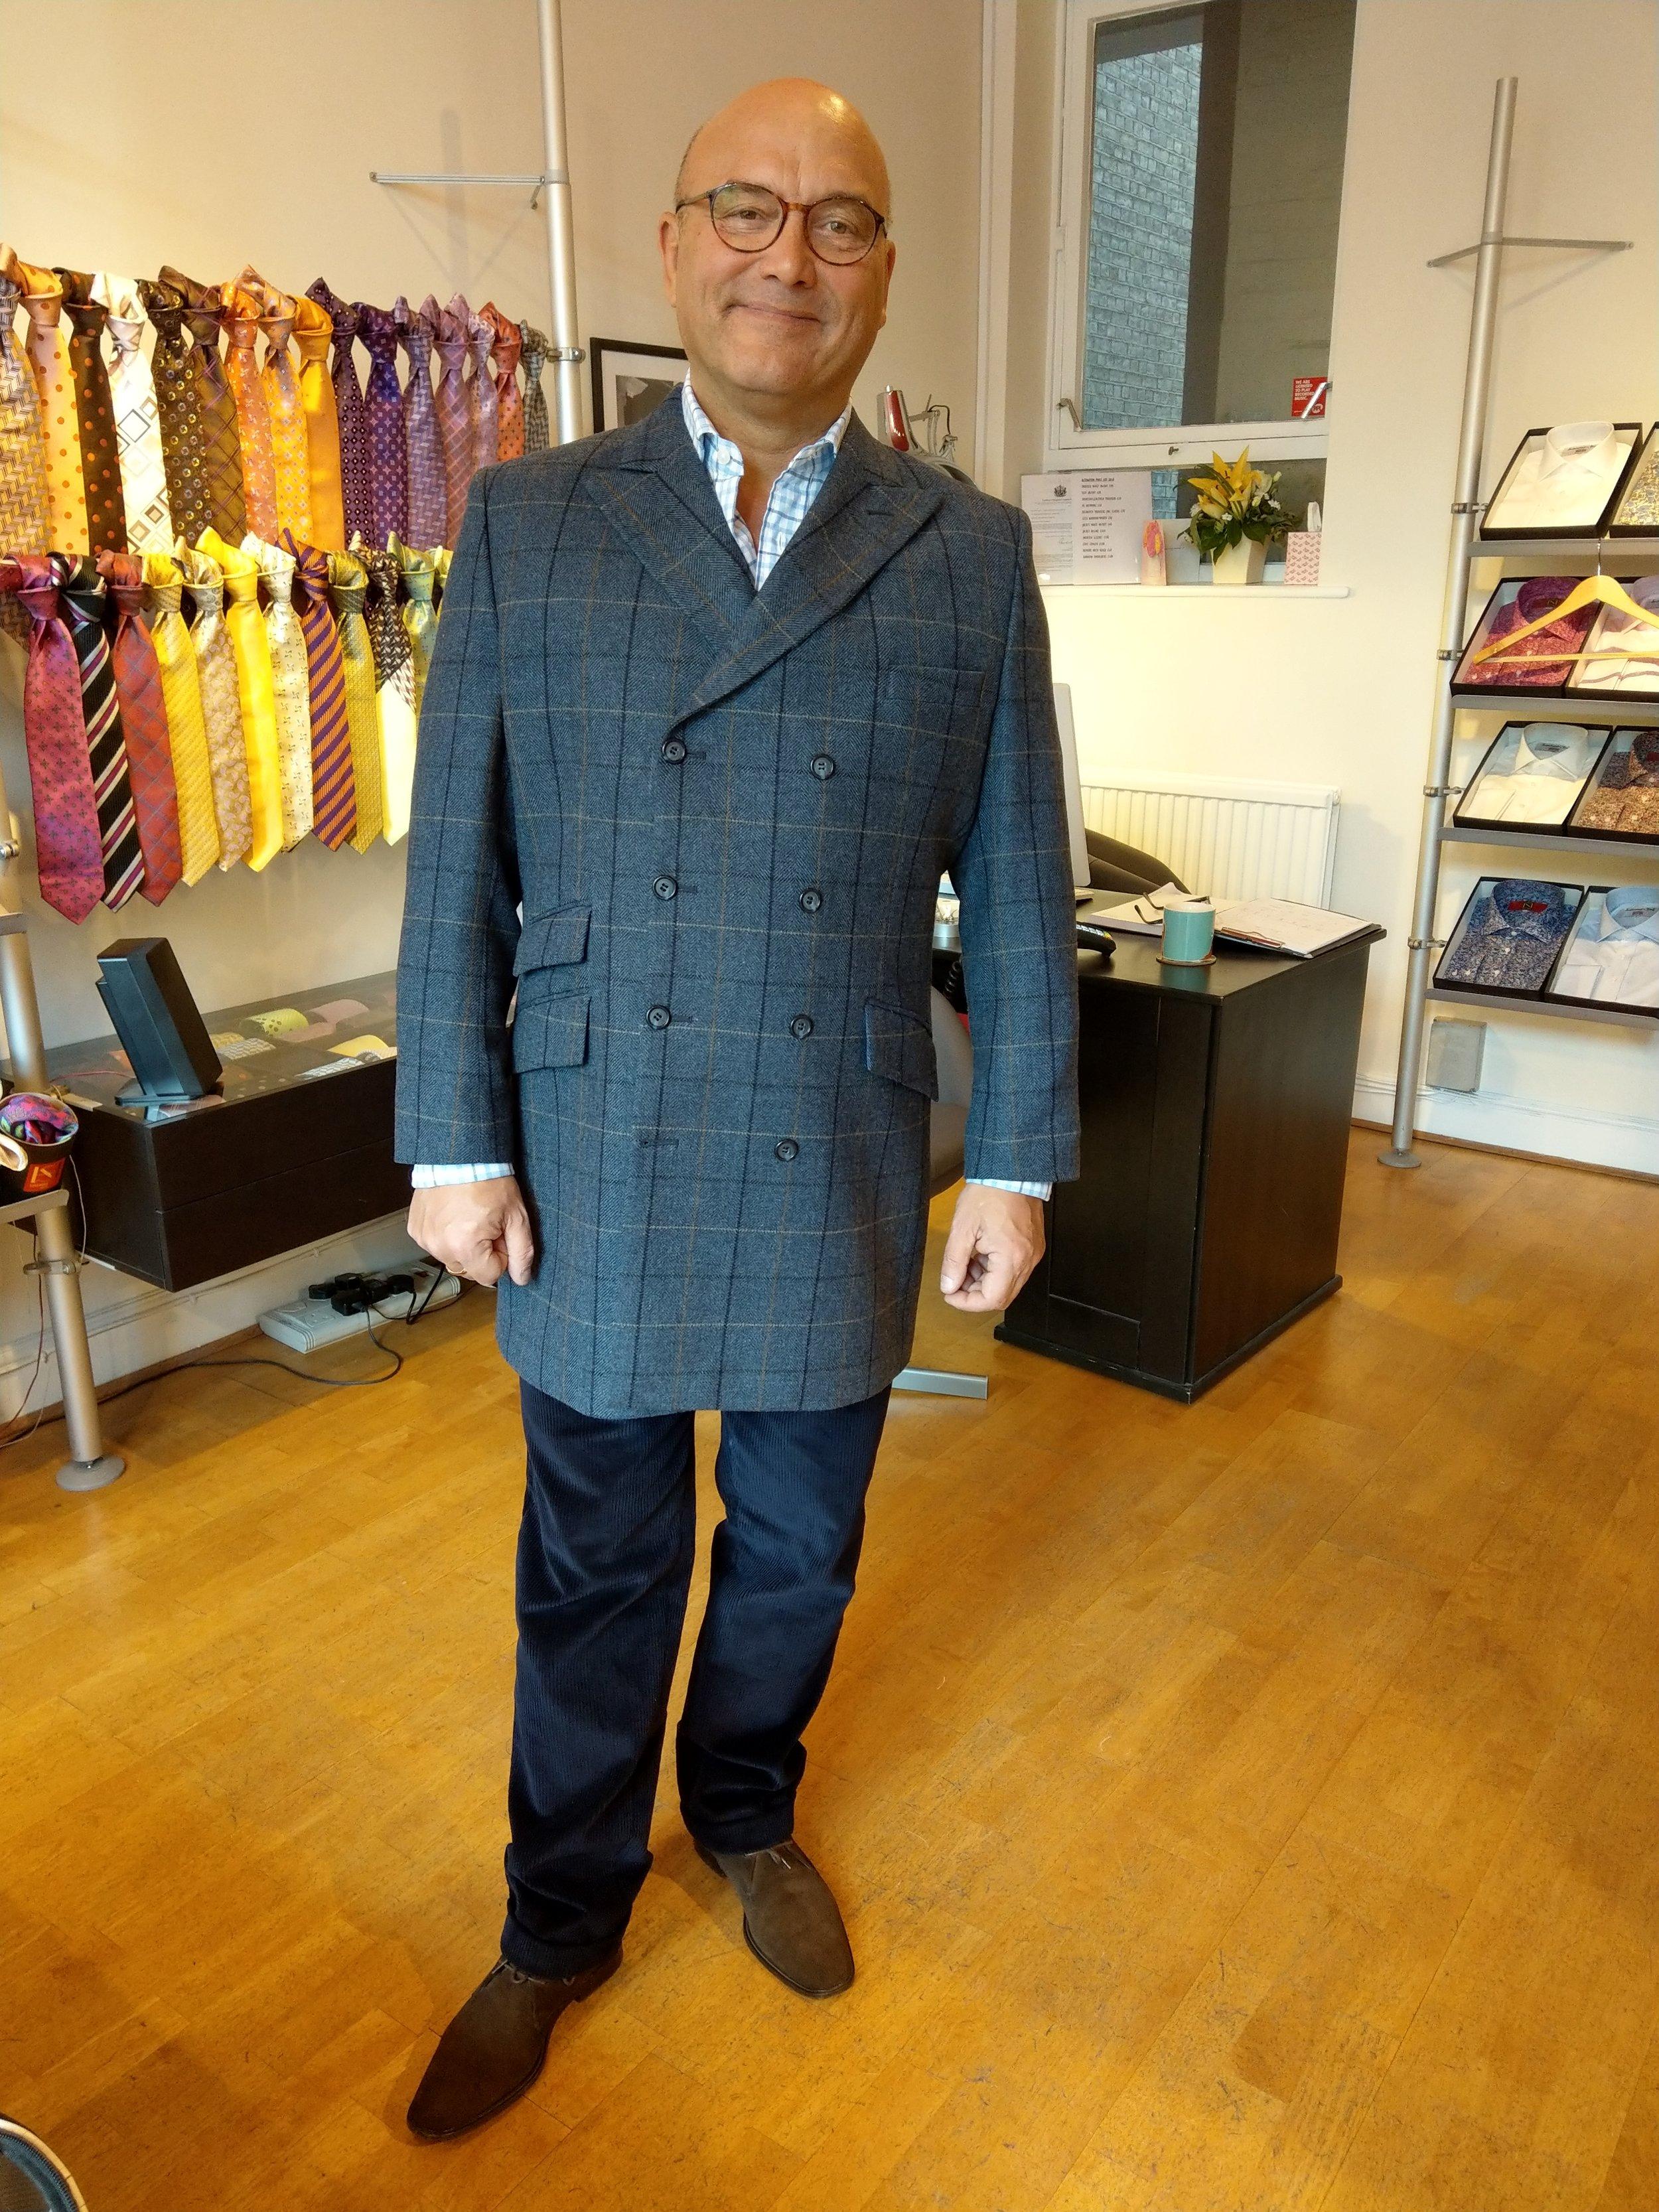 gregg-wallace-susannah-hall-tailor-bespoke-double-breasted-tweed-moon-coat-jacket.jpg